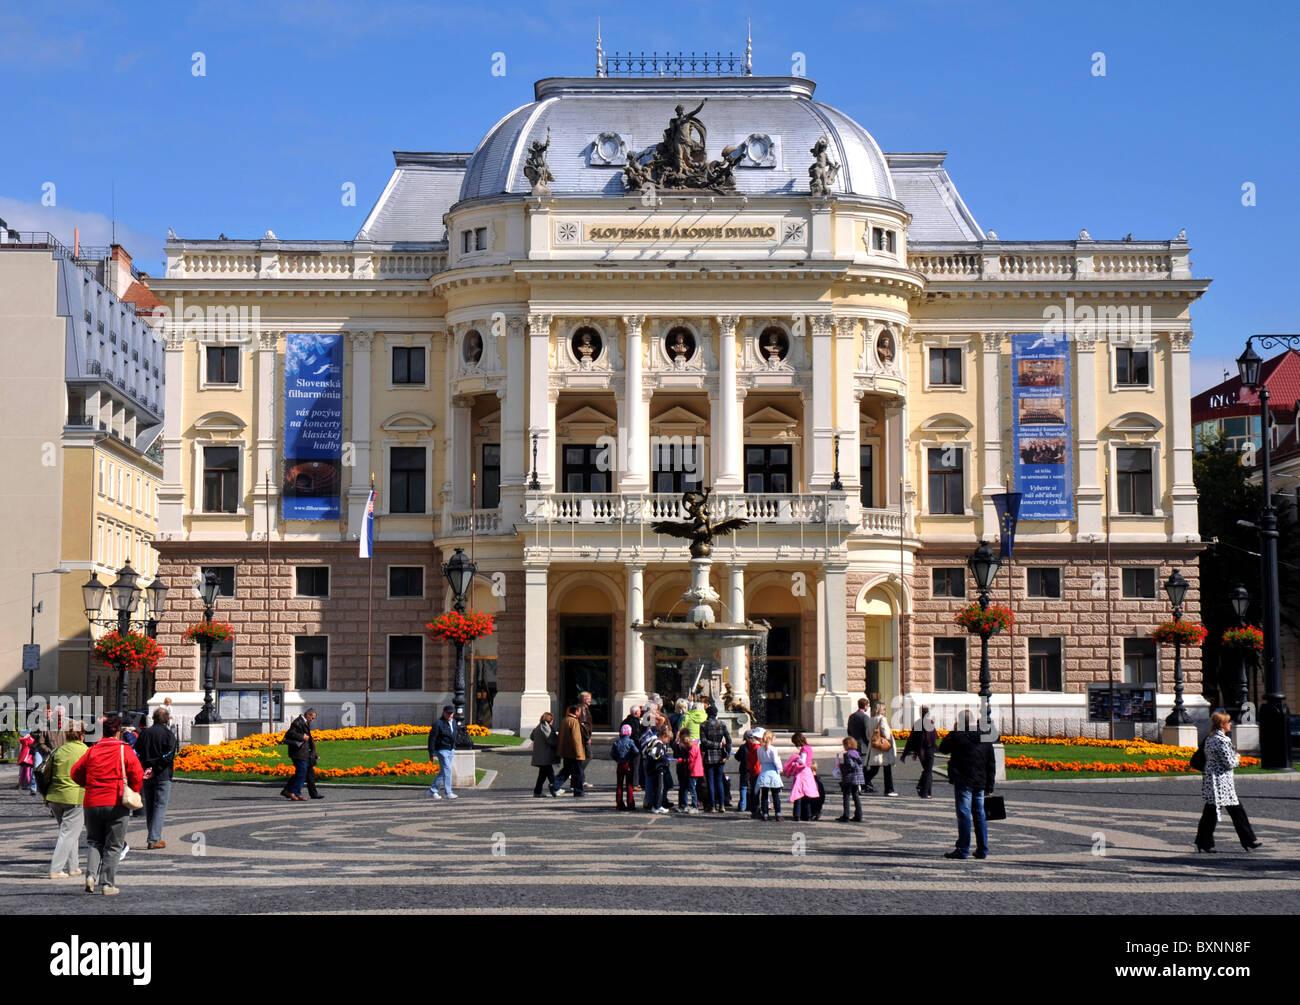 The Opera House, Bratislava, Slovakia, Europe - Stock Image